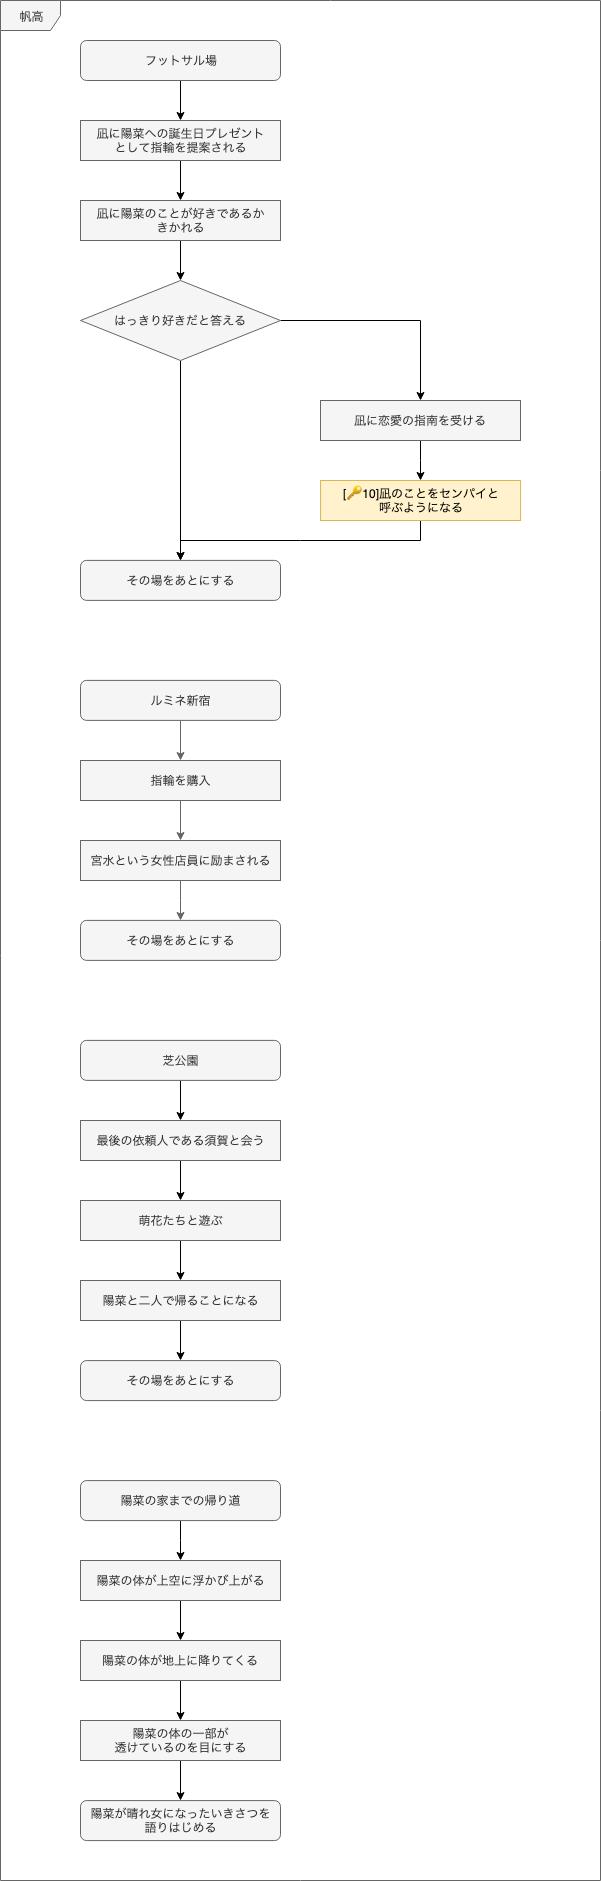 https://cdn-ak.f.st-hatena.com/images/fotolife/m/munieru_jp/20190913/20190913113237_original.png